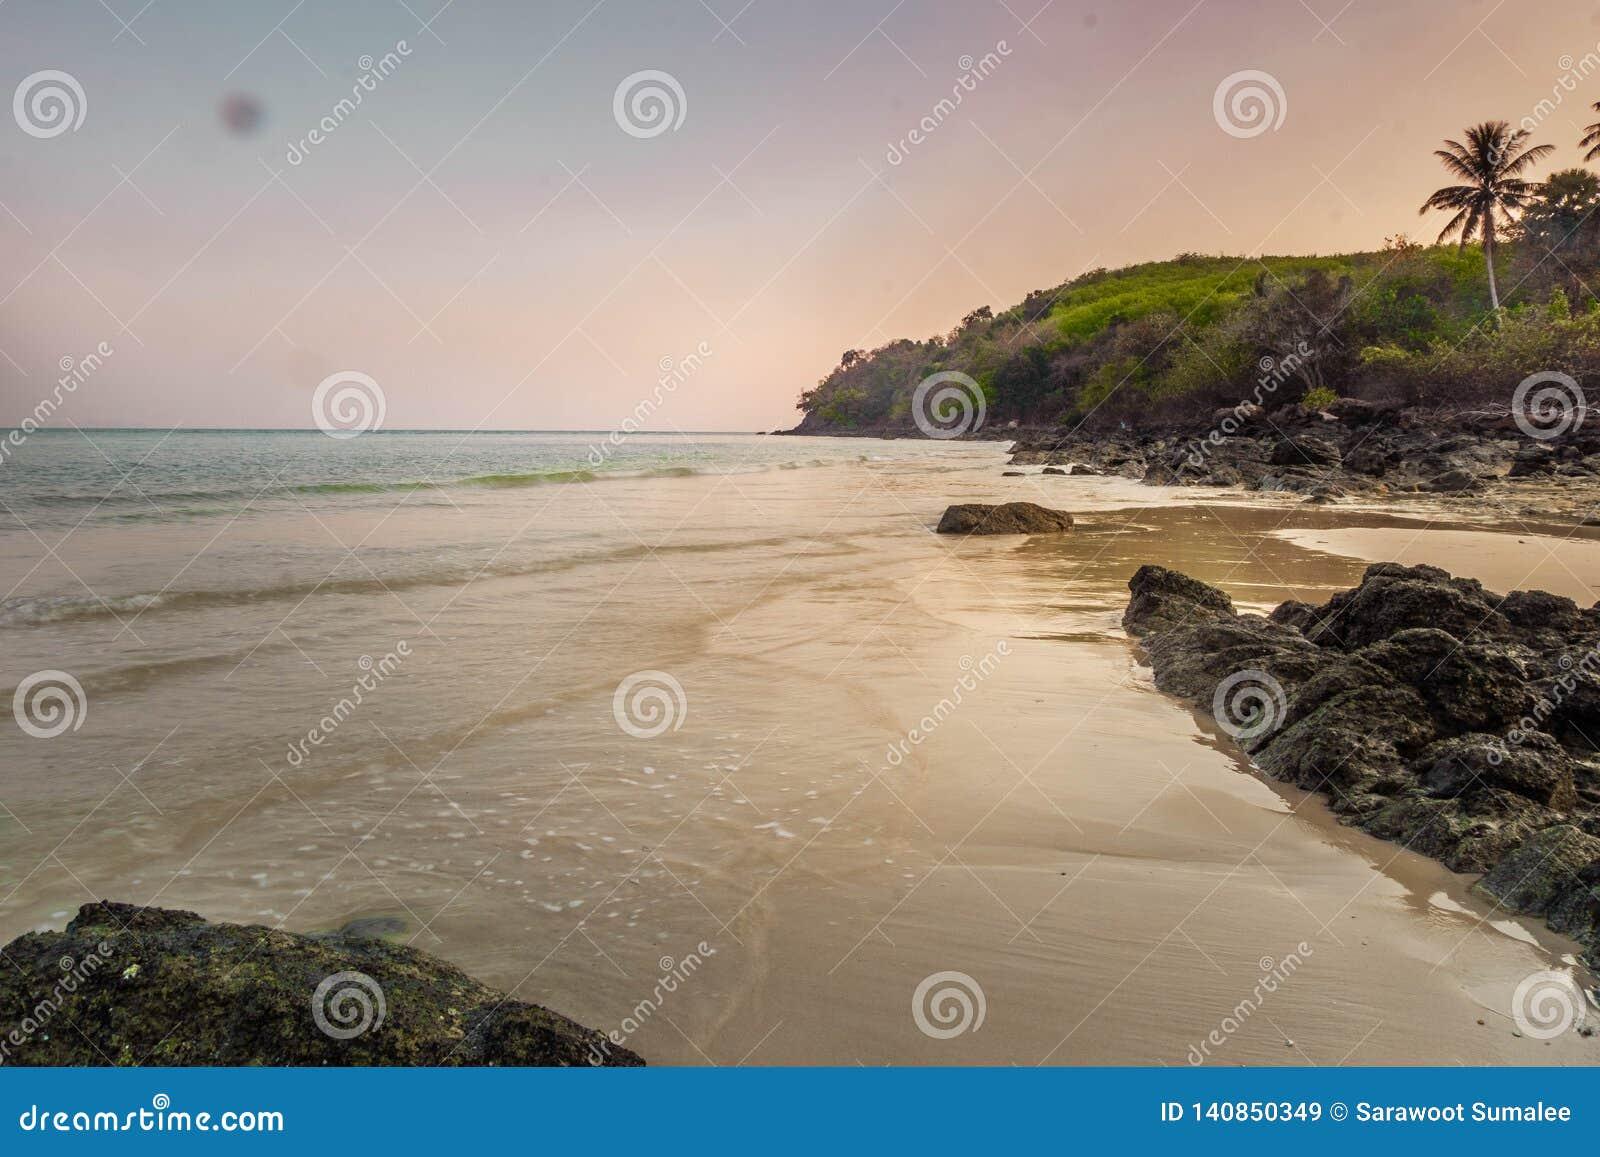 Landschap van stil strand in overzees Zuid-Thailand, Phang Nga, Thailand